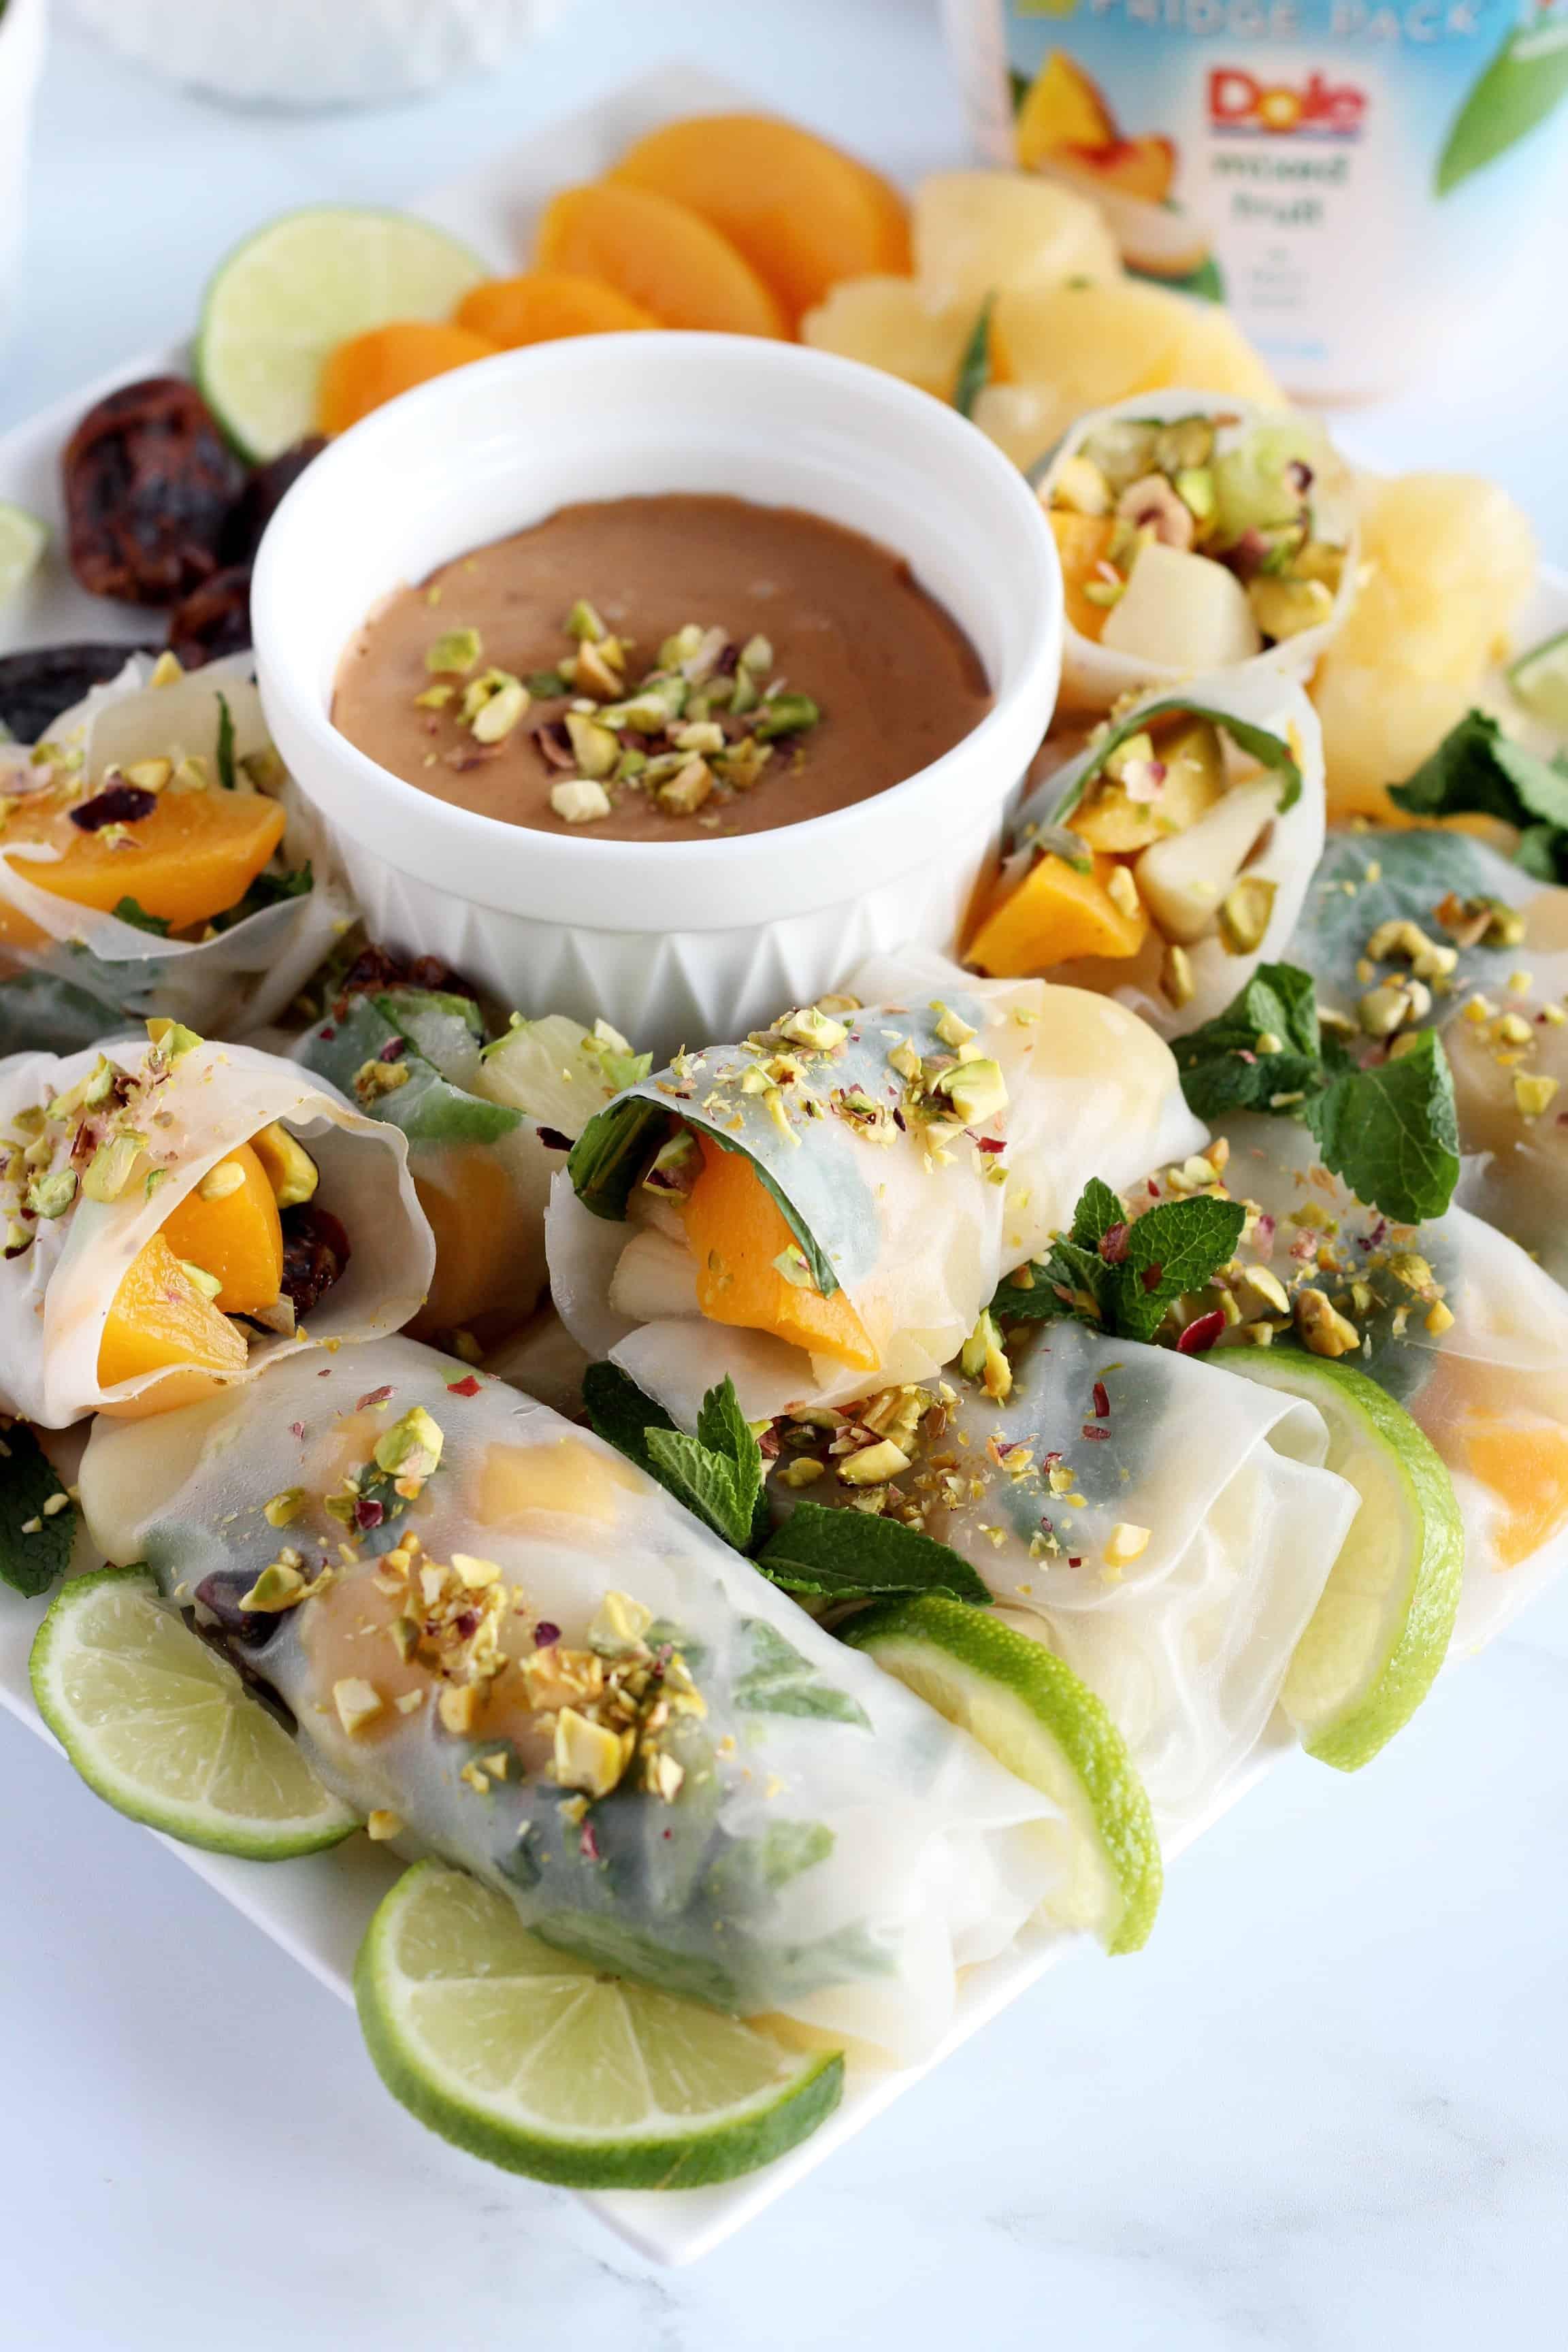 Julia Recipes Dole Mixed Fruit Fridge Pack 4